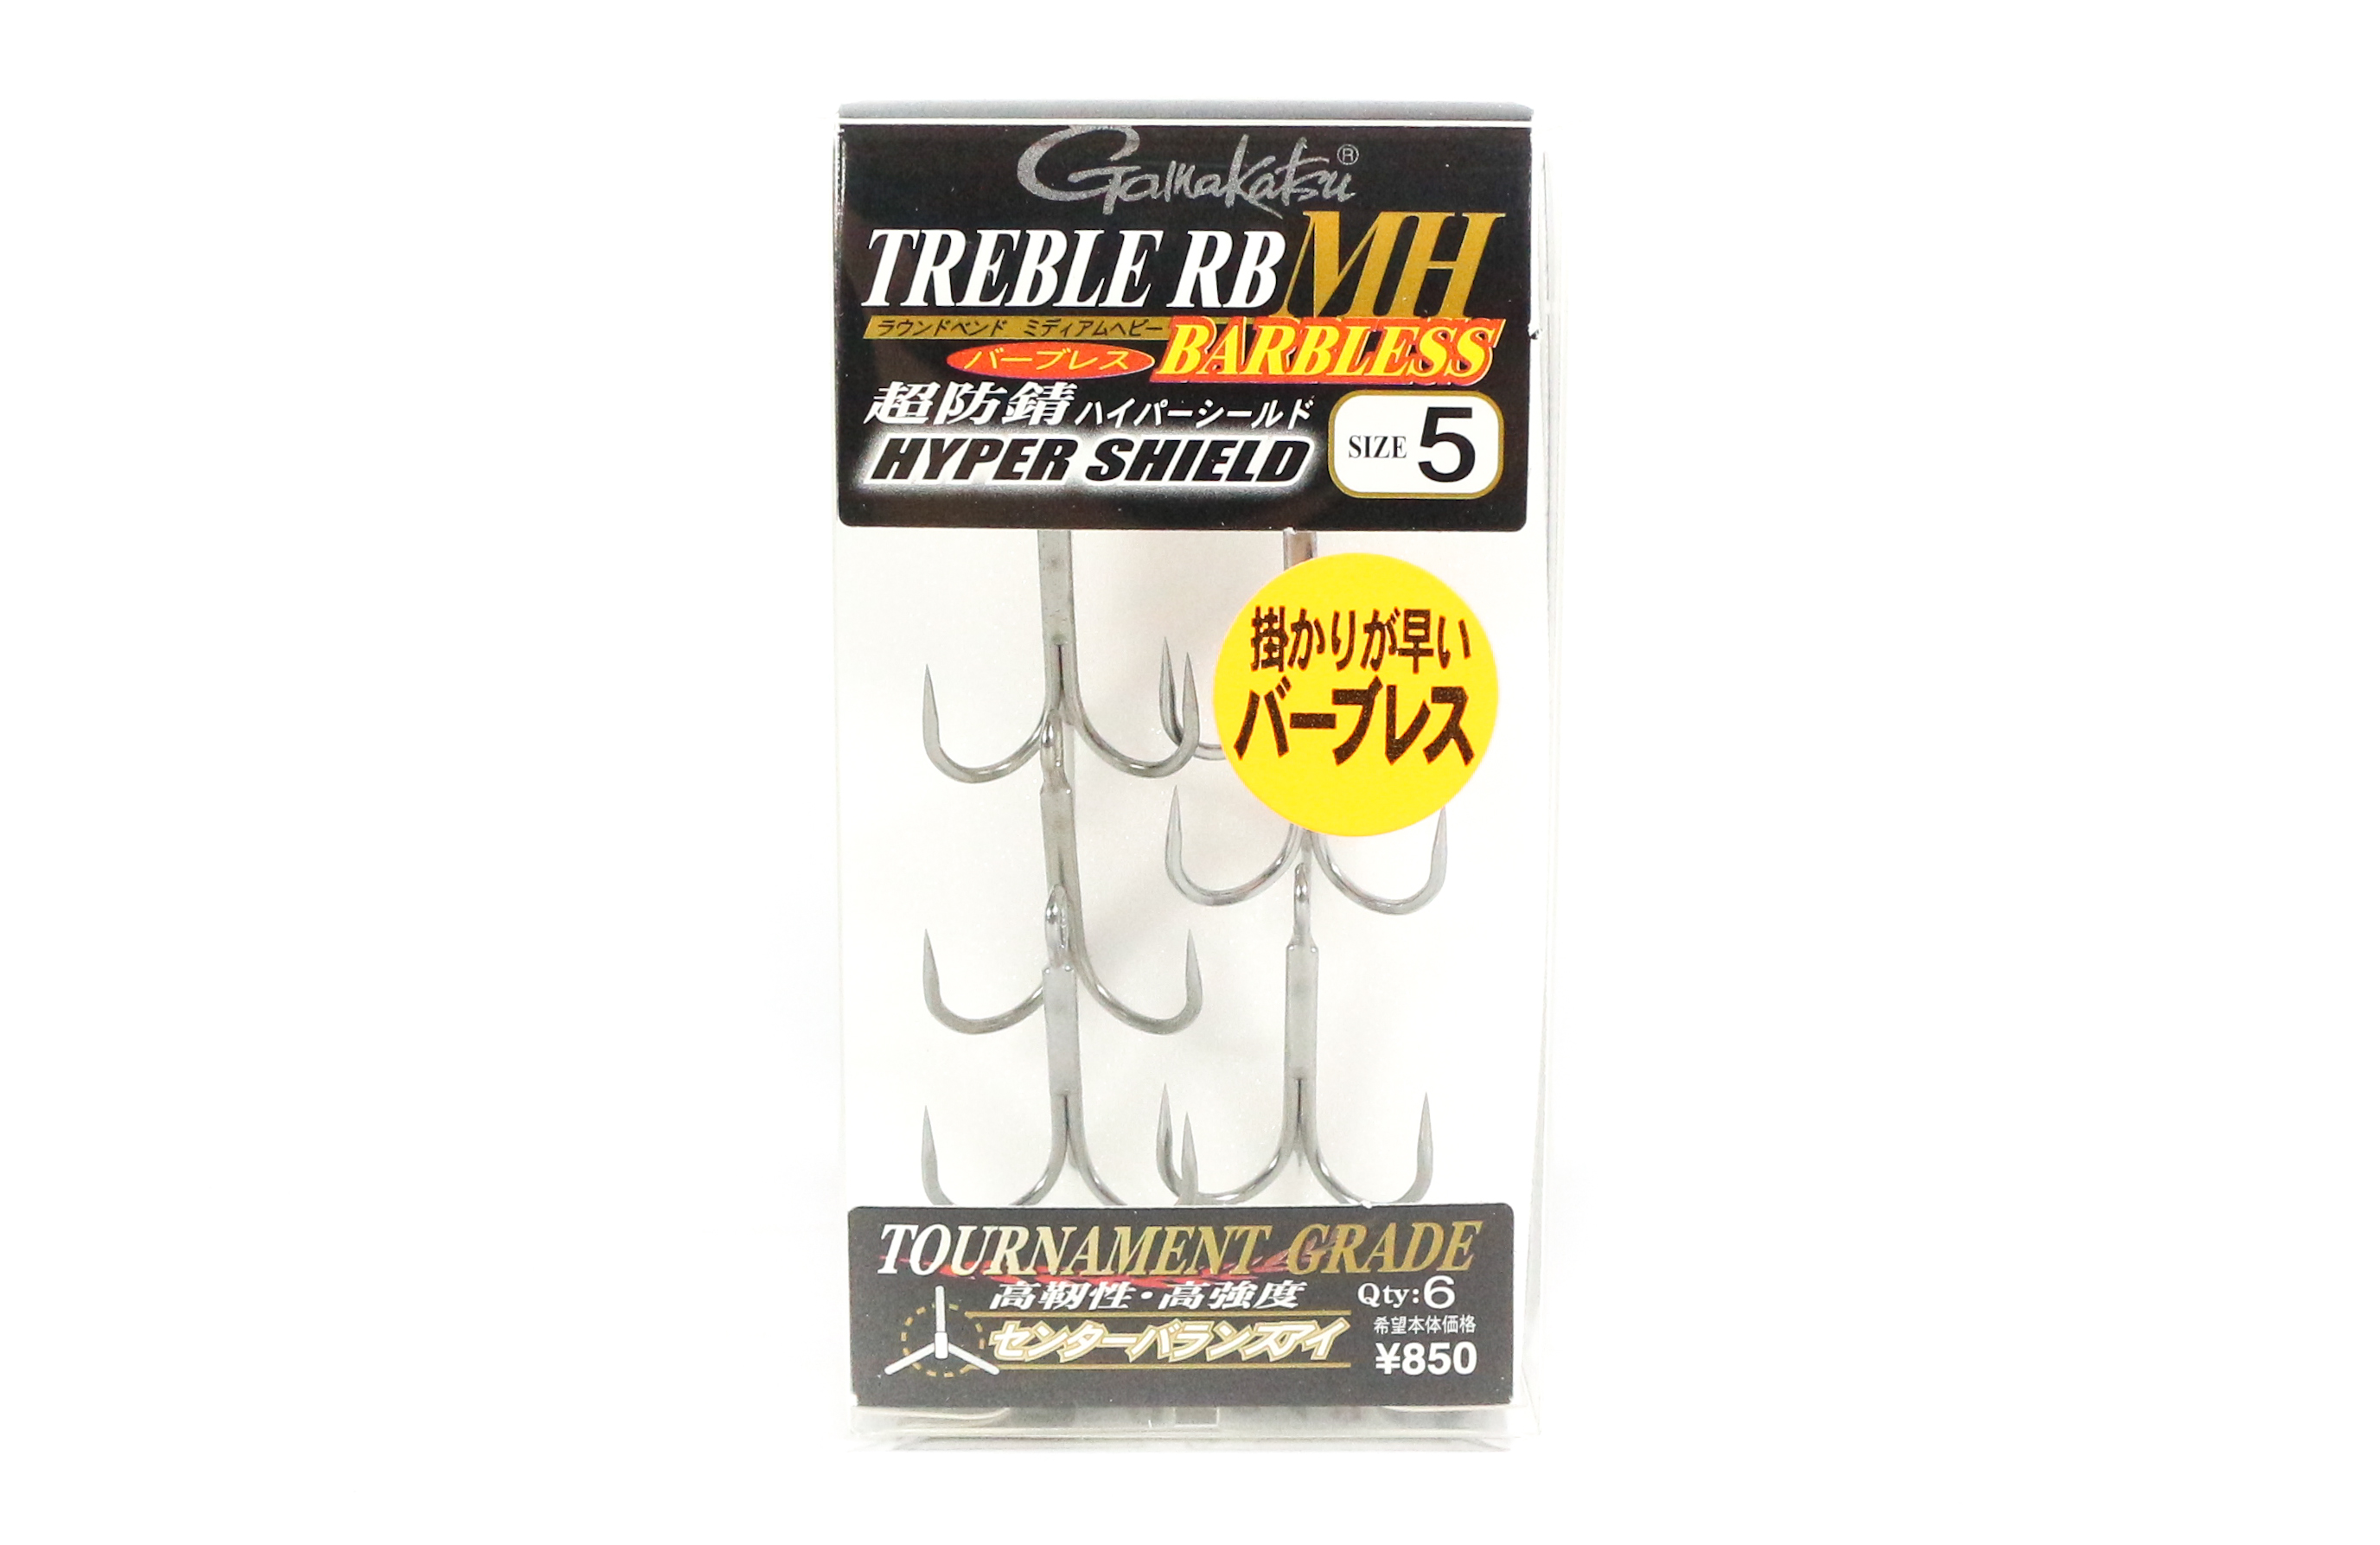 Gamakatsu Treble Hook RB MH BL Barbless Hyper Shield Size 5 (9168)